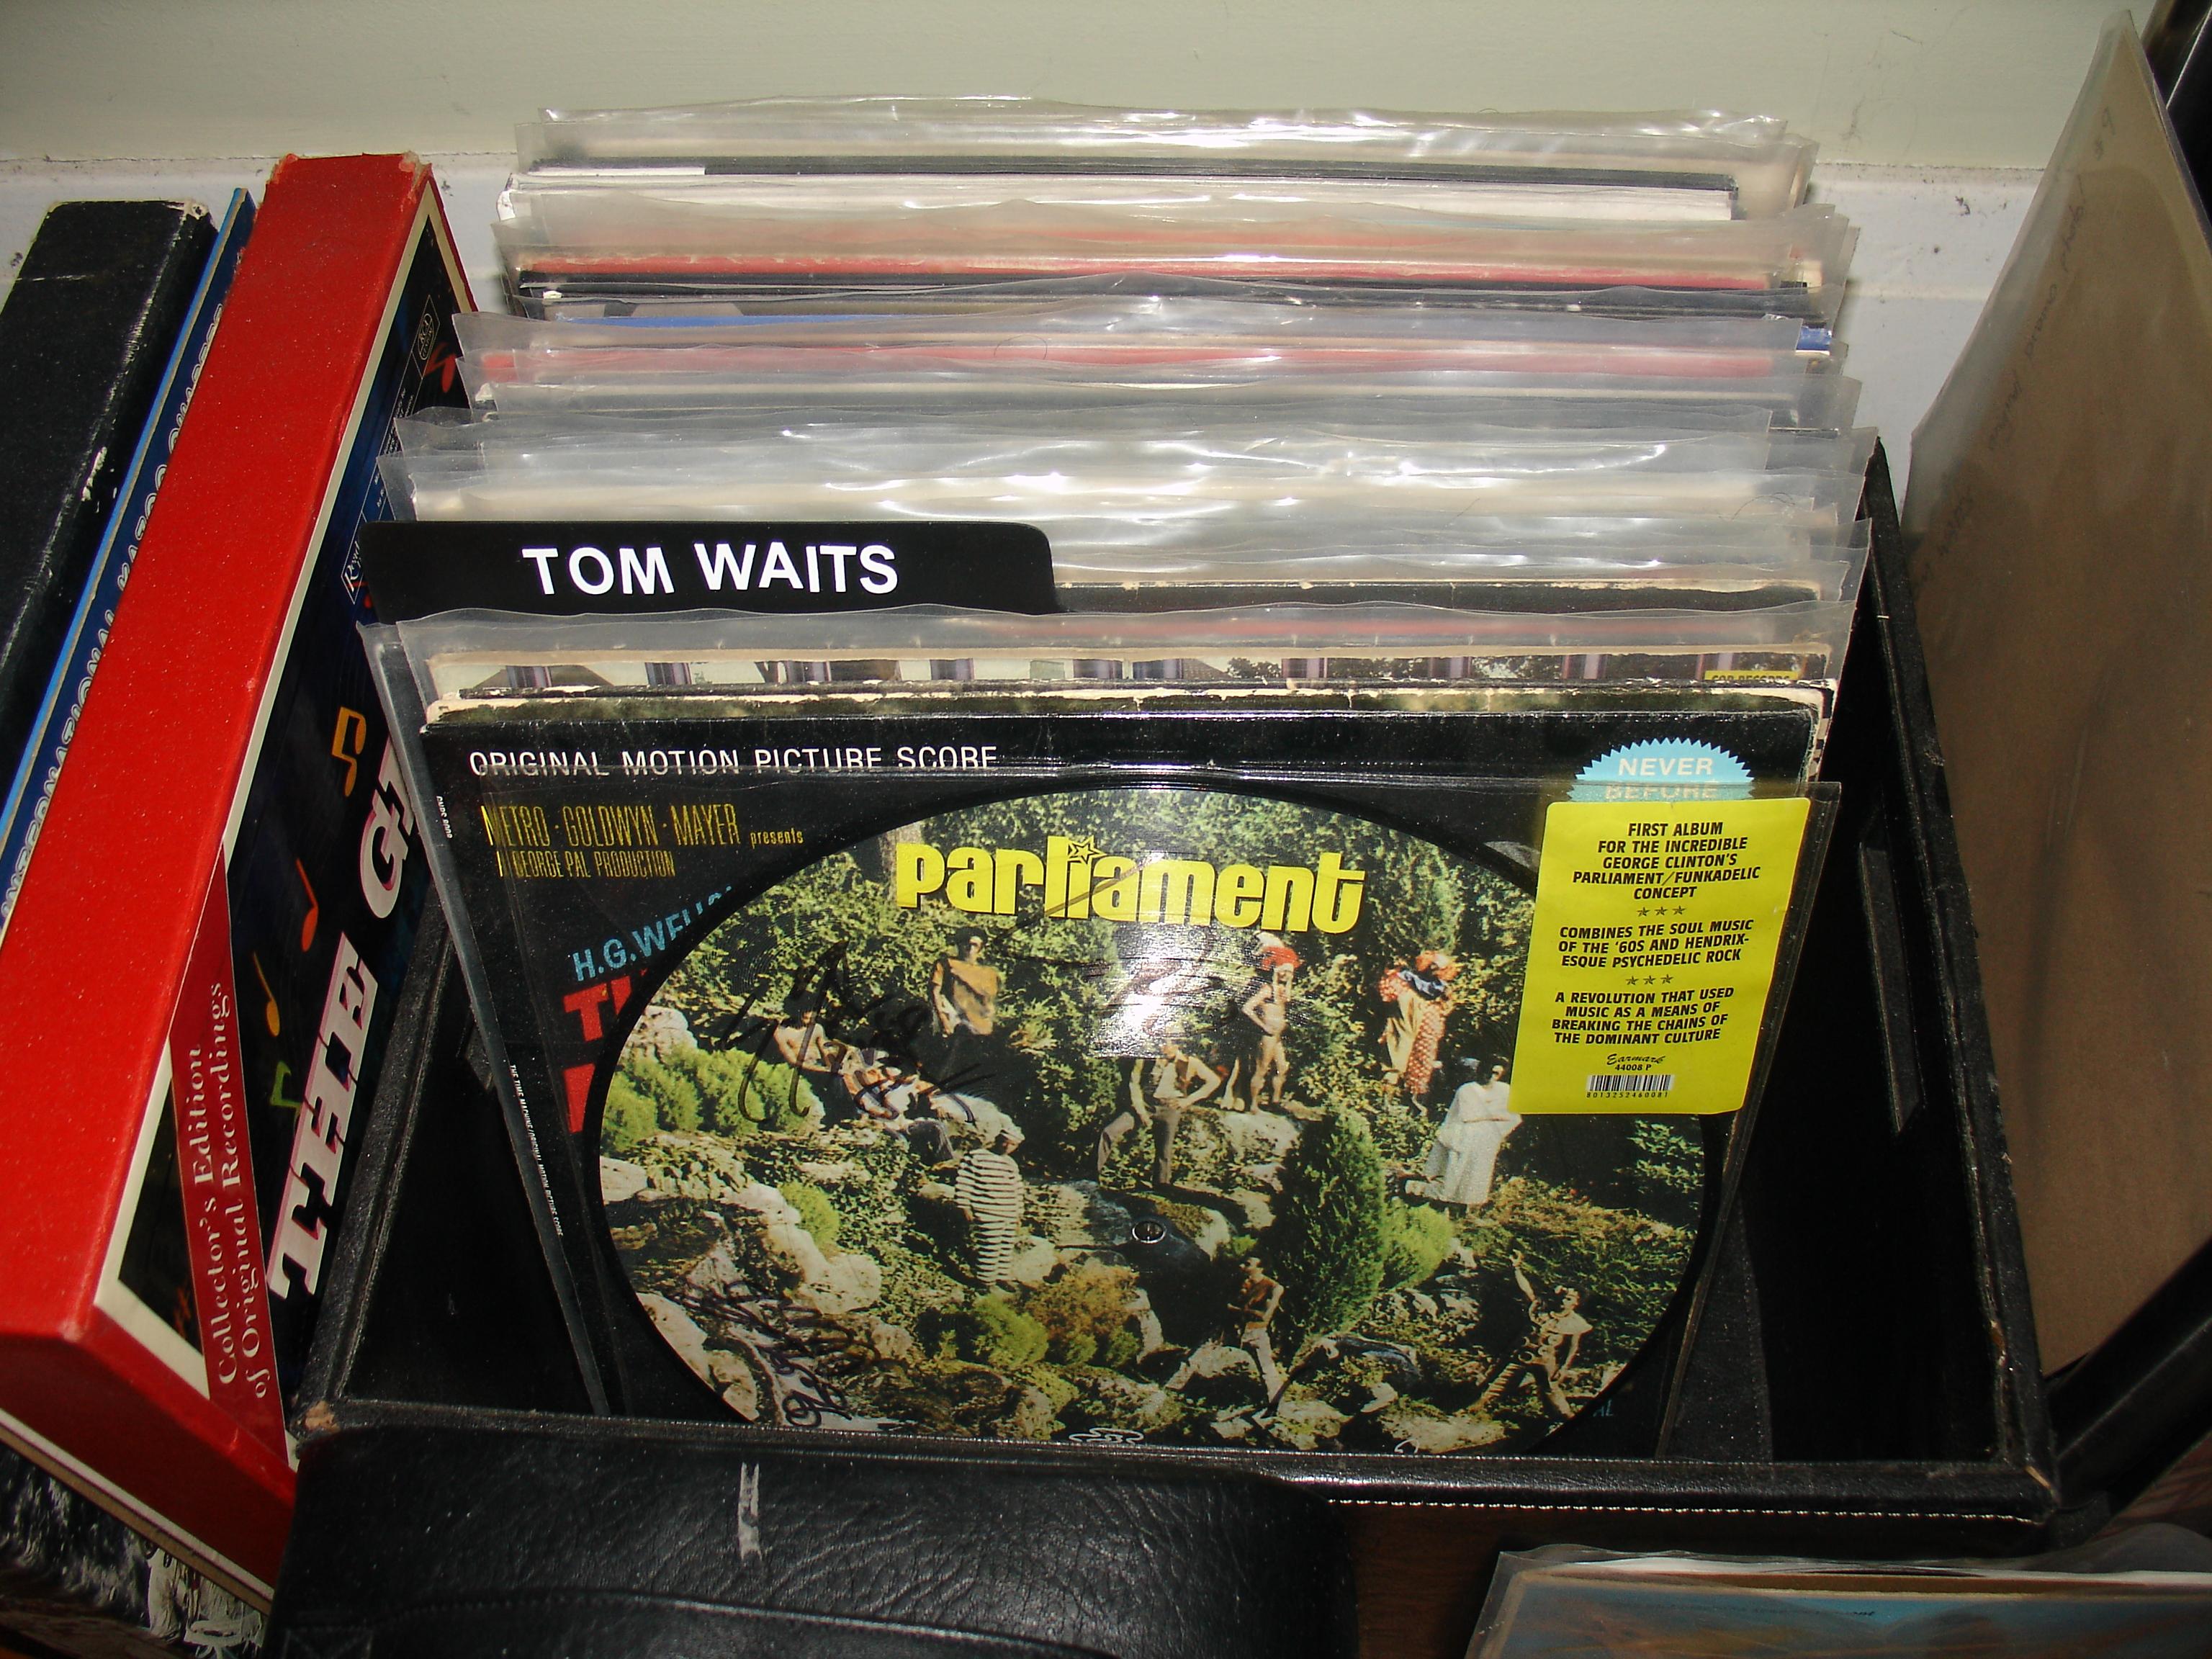 06 Tom Waits